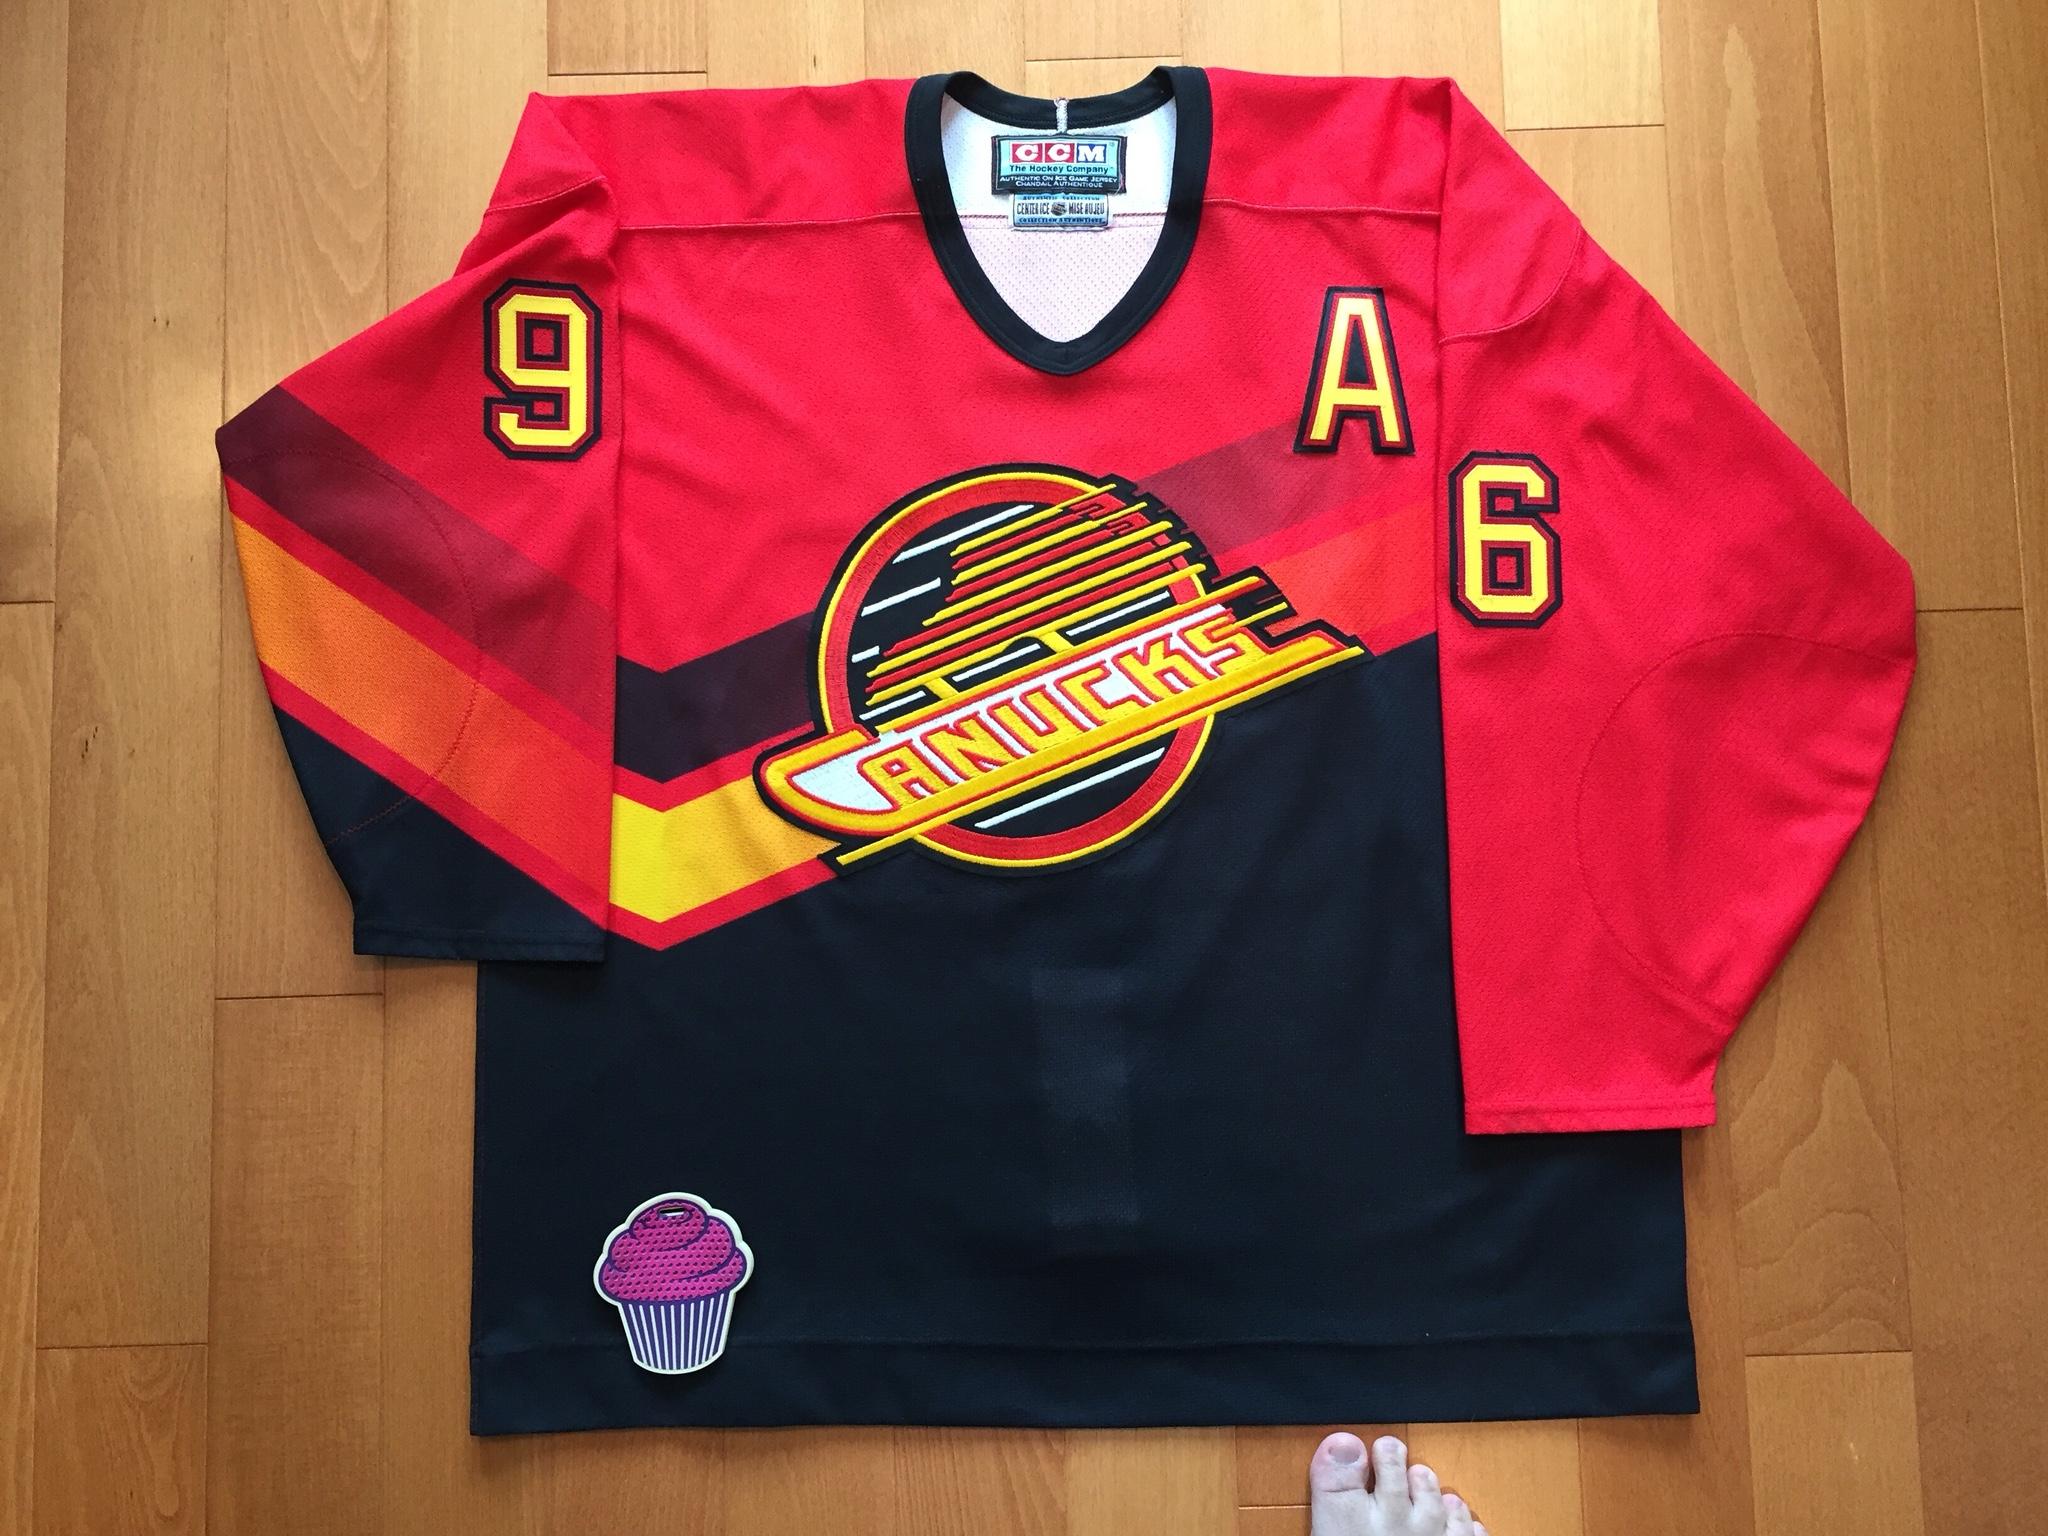 f3ba5acd About skates alternate jersey - Canucks Talk - Canucks Community